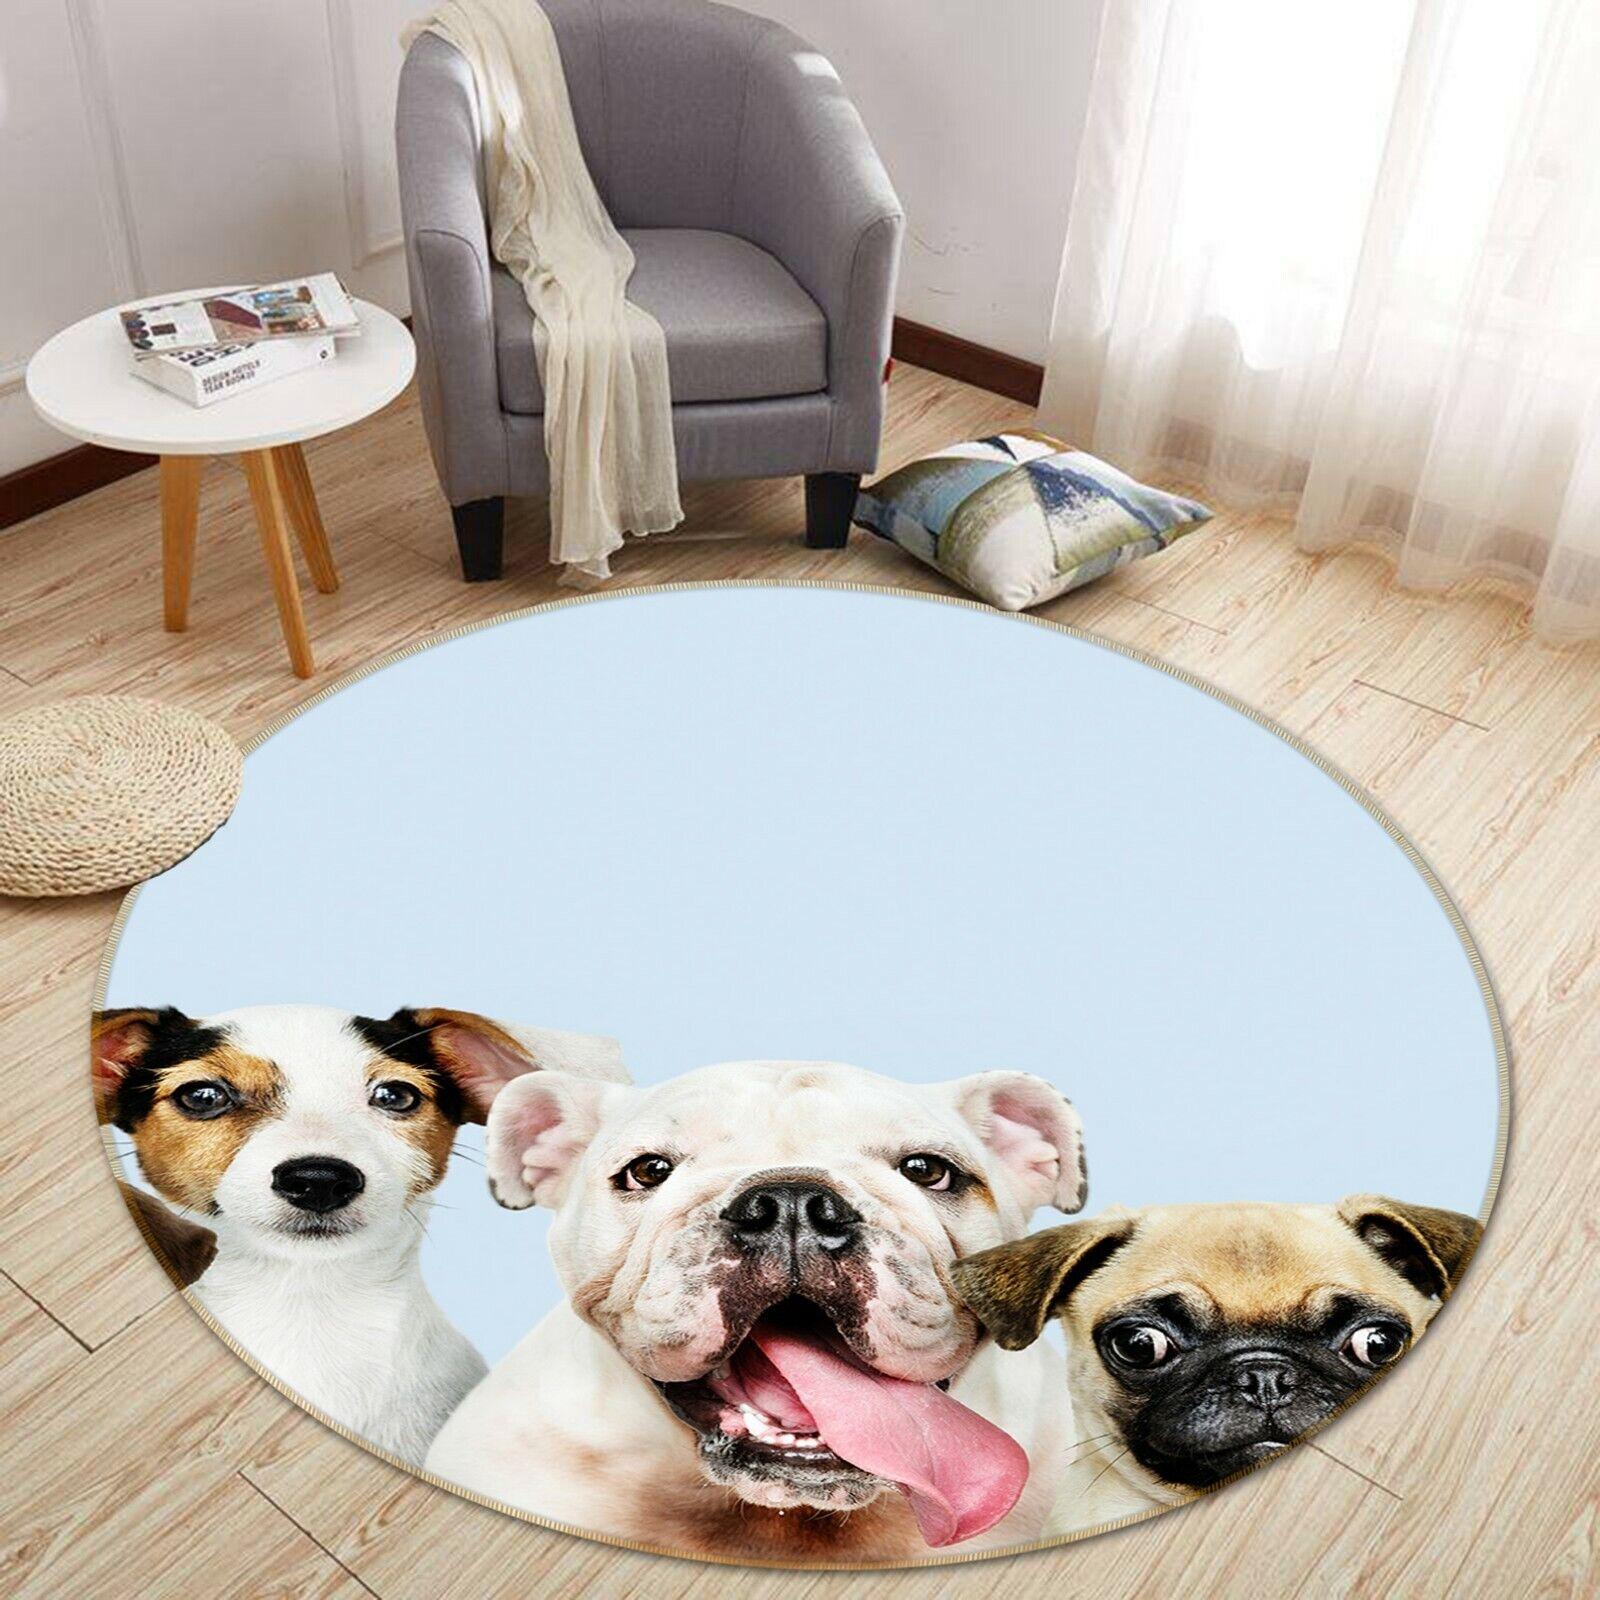 3D Carino cani B007 Animale tappetino antiscivolo tappeto rossoondo elegante Tappeto Wendy